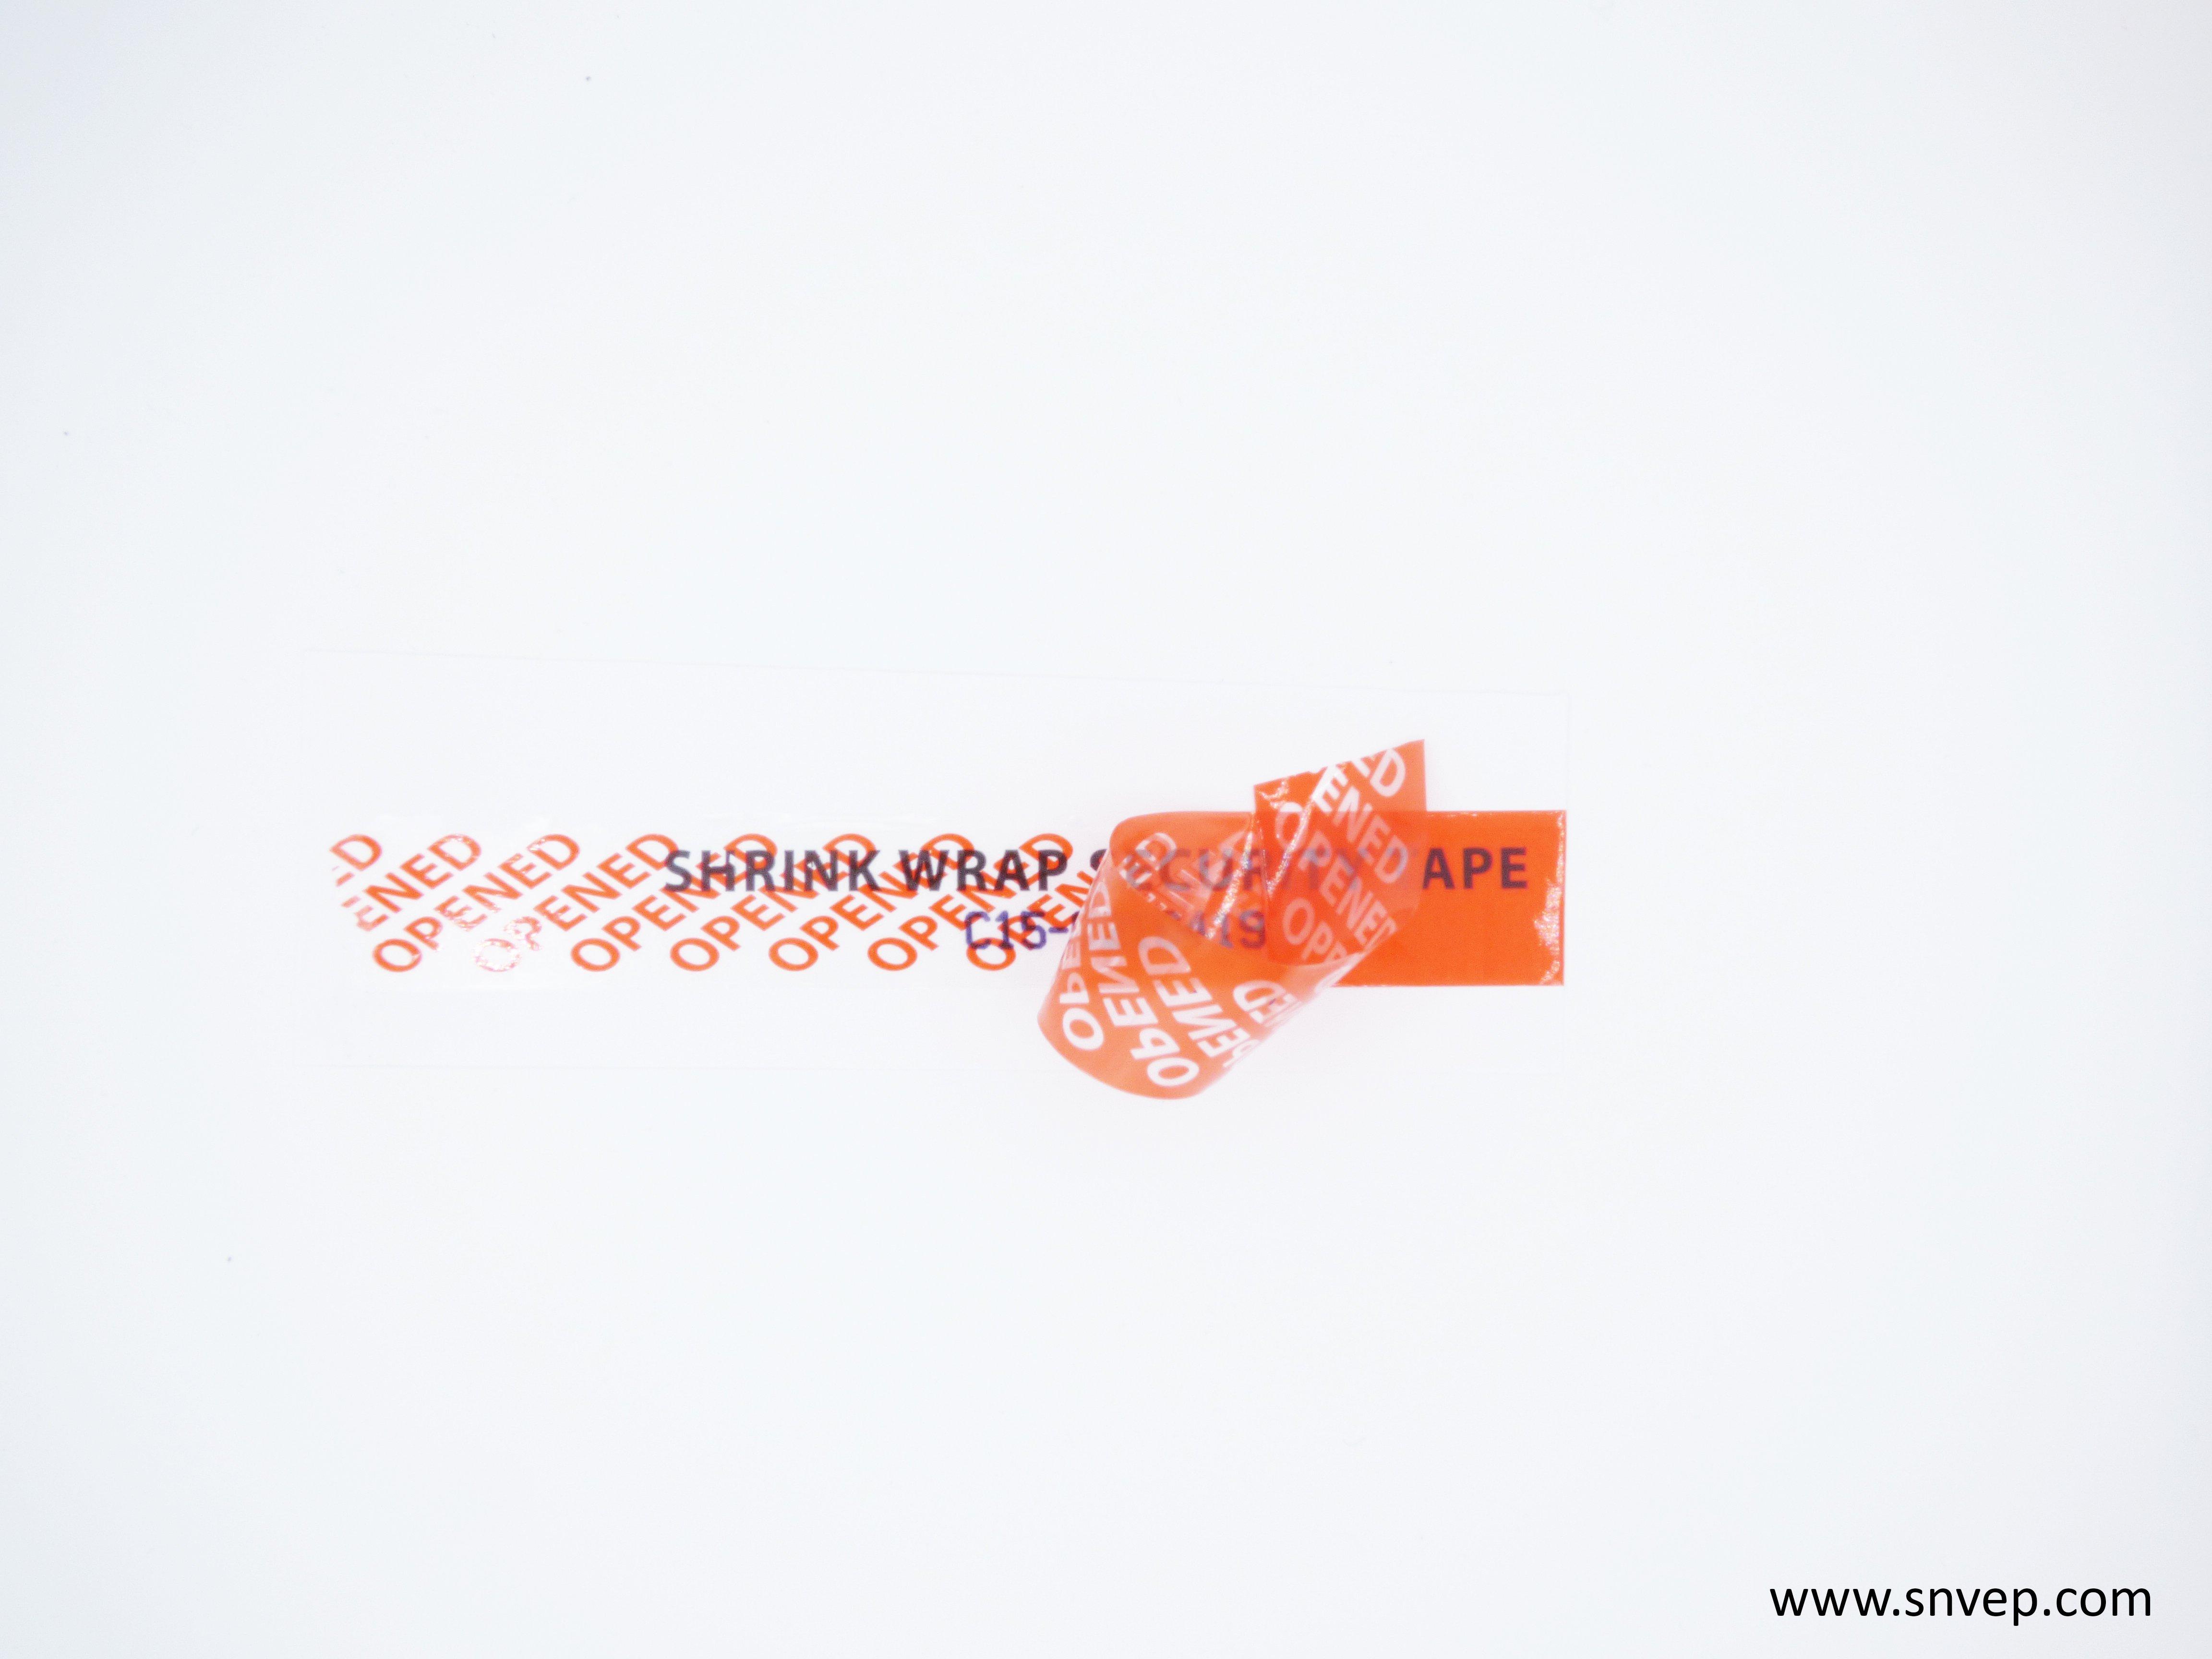 STRETCH WRAP SECURE Tape